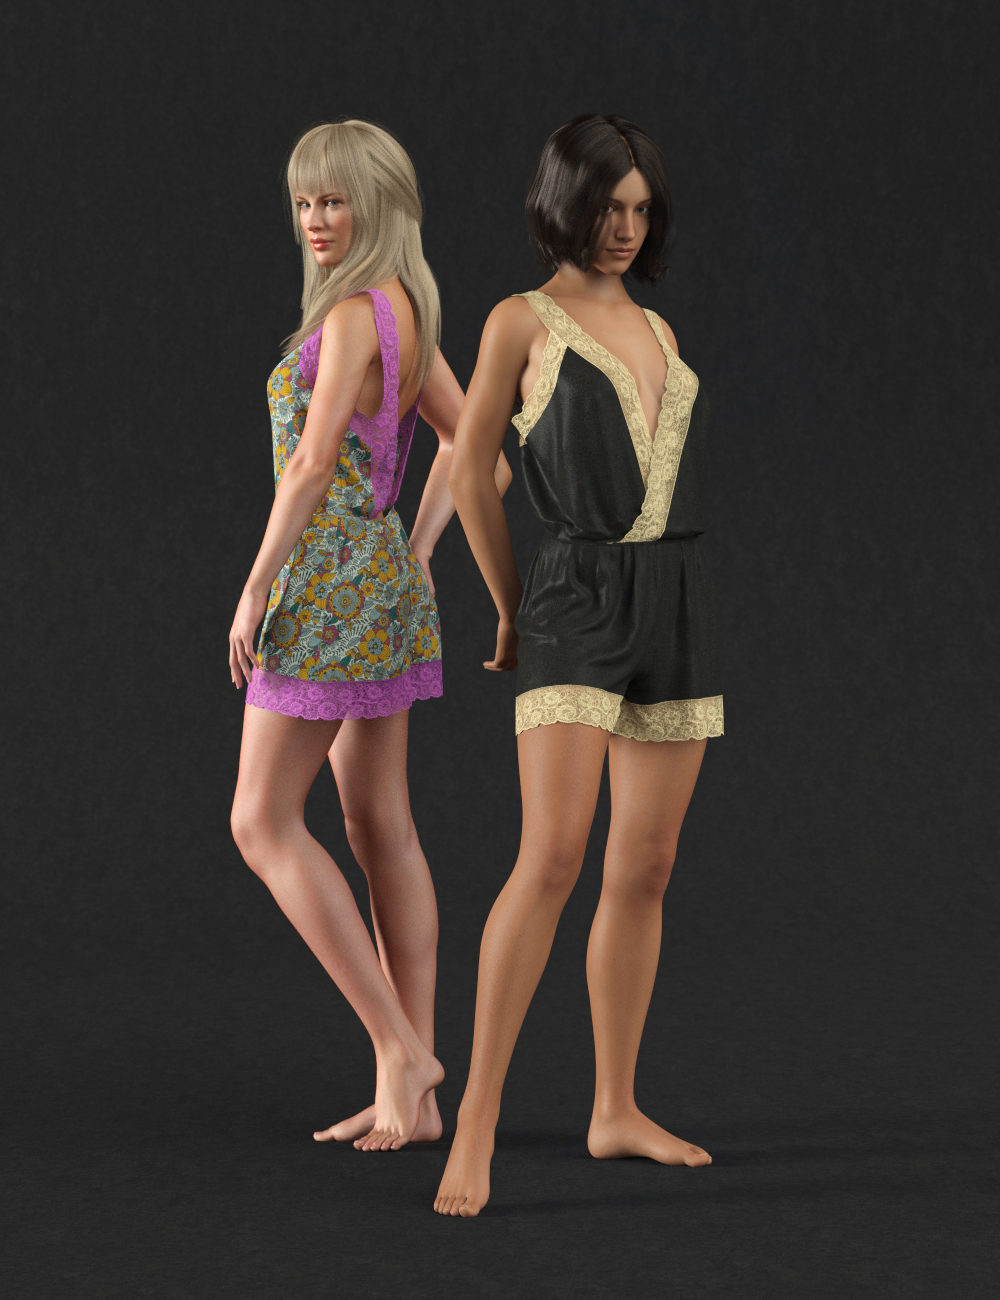 dForce Retro Romper for Genesis 8 Female(s) by: Sprite, 3D Models by Daz 3D